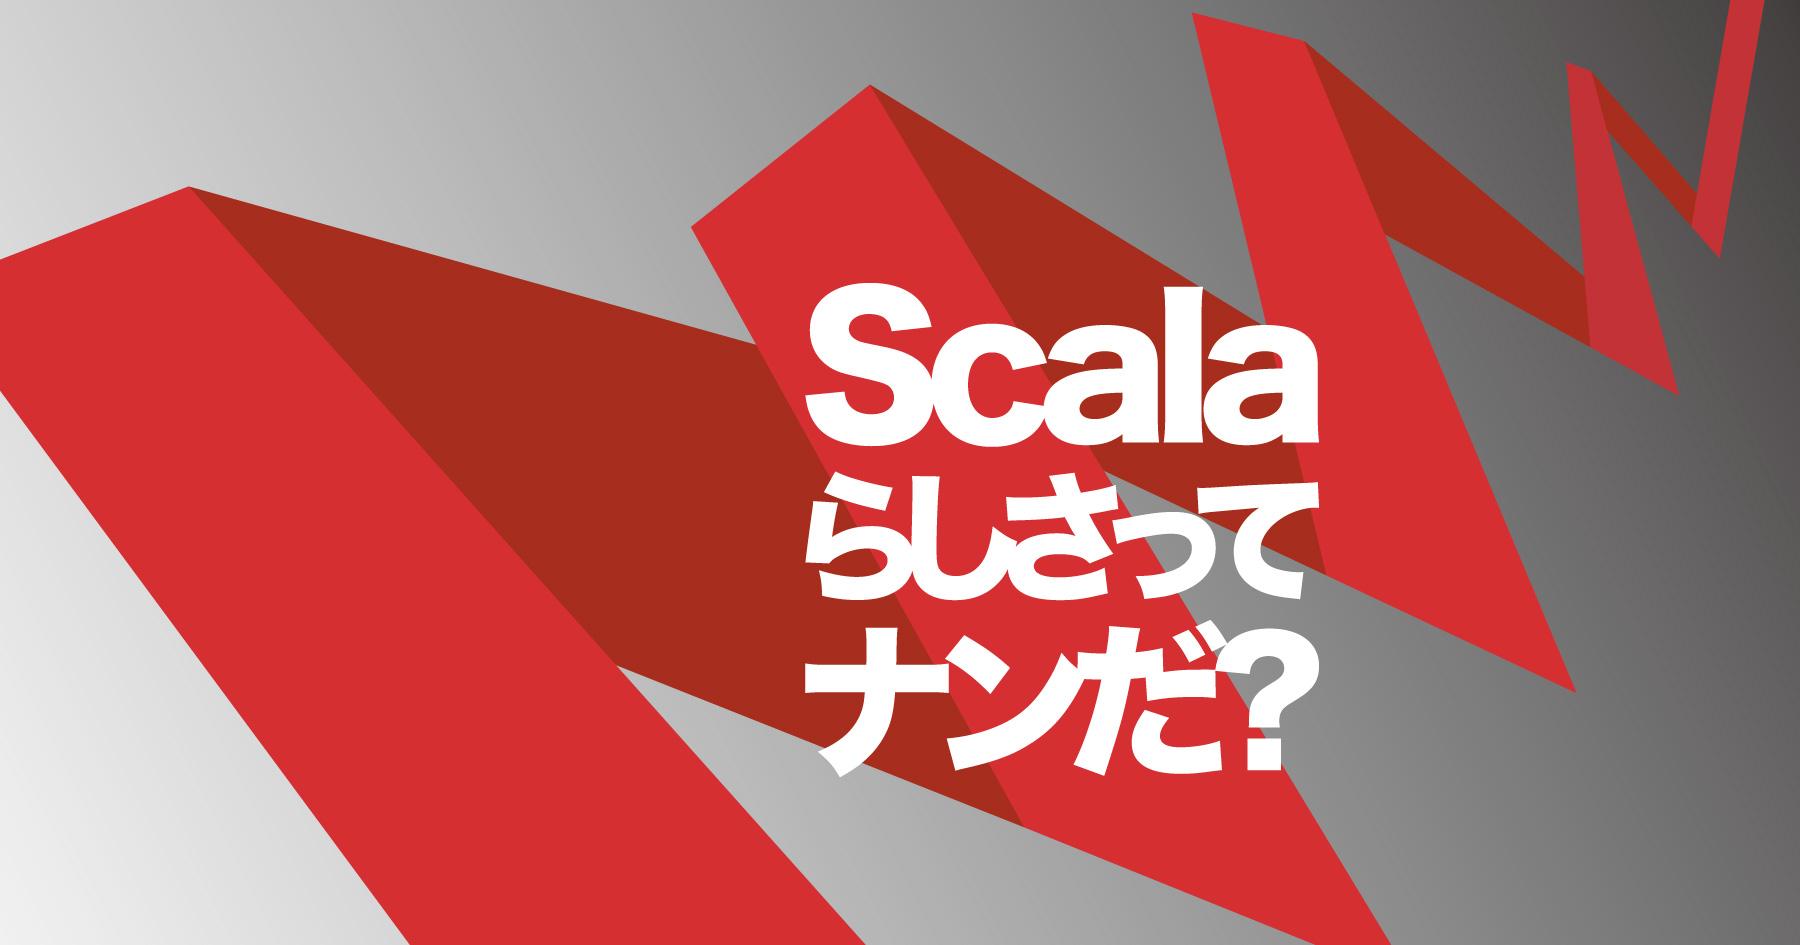 Scalla OGP